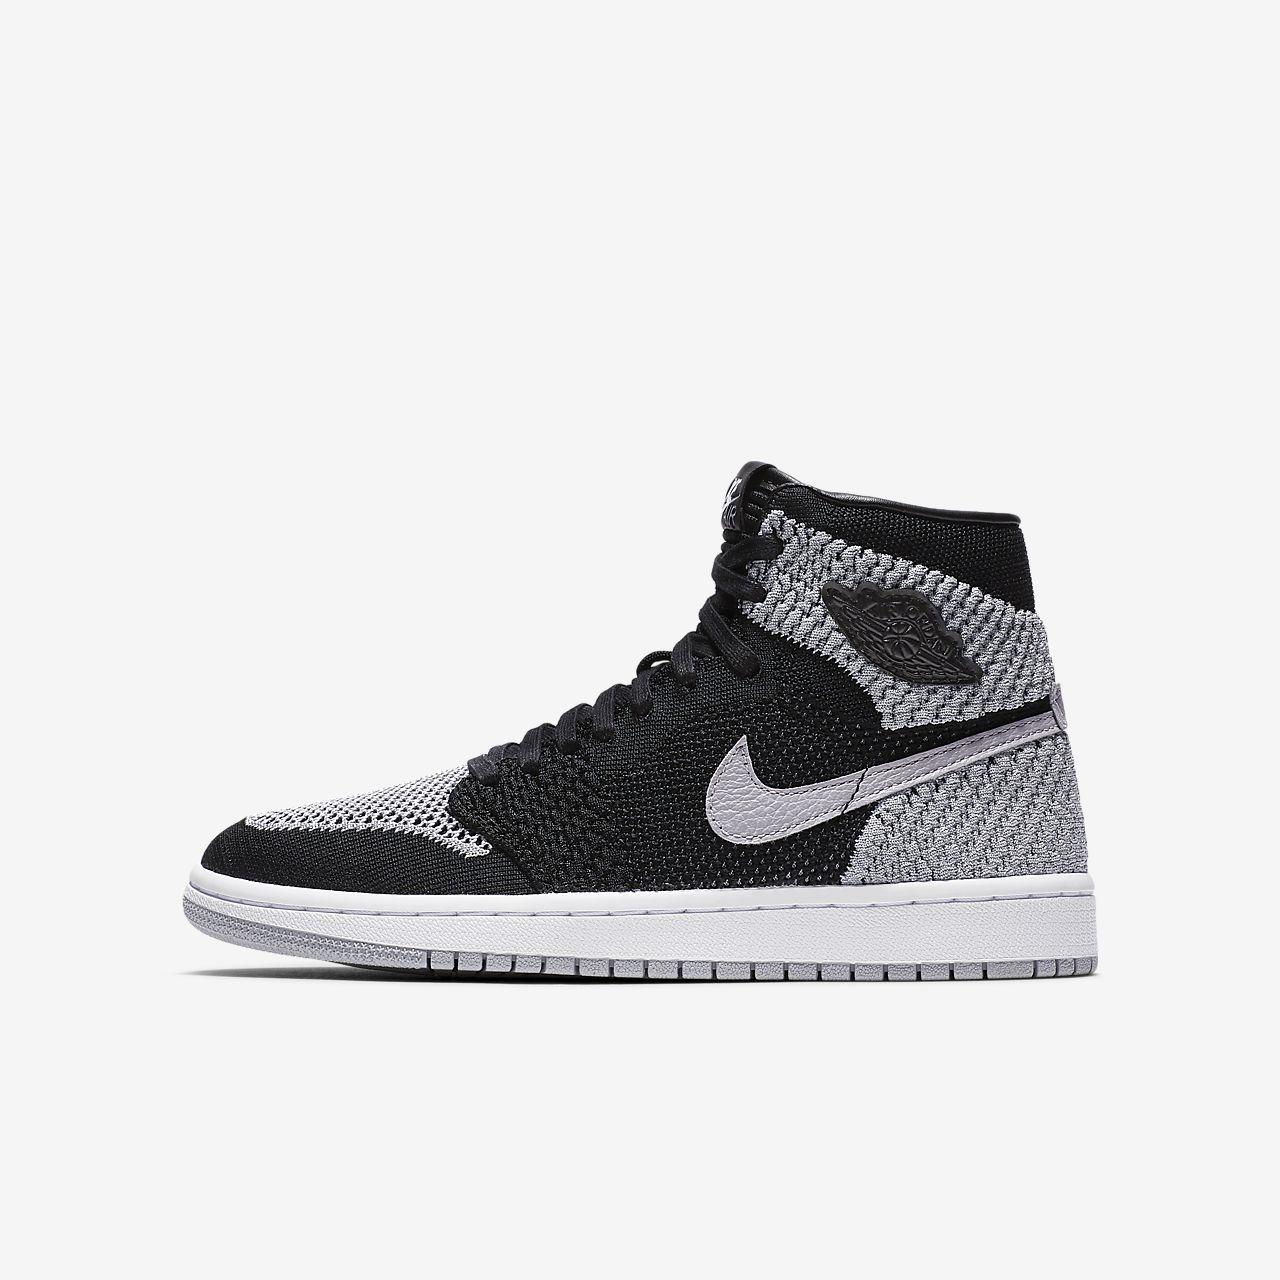 Zapatos Nike Jordan ni?±os peque?±os Jordan Retro 8 Bt Baloncesto jrc1kN8Is